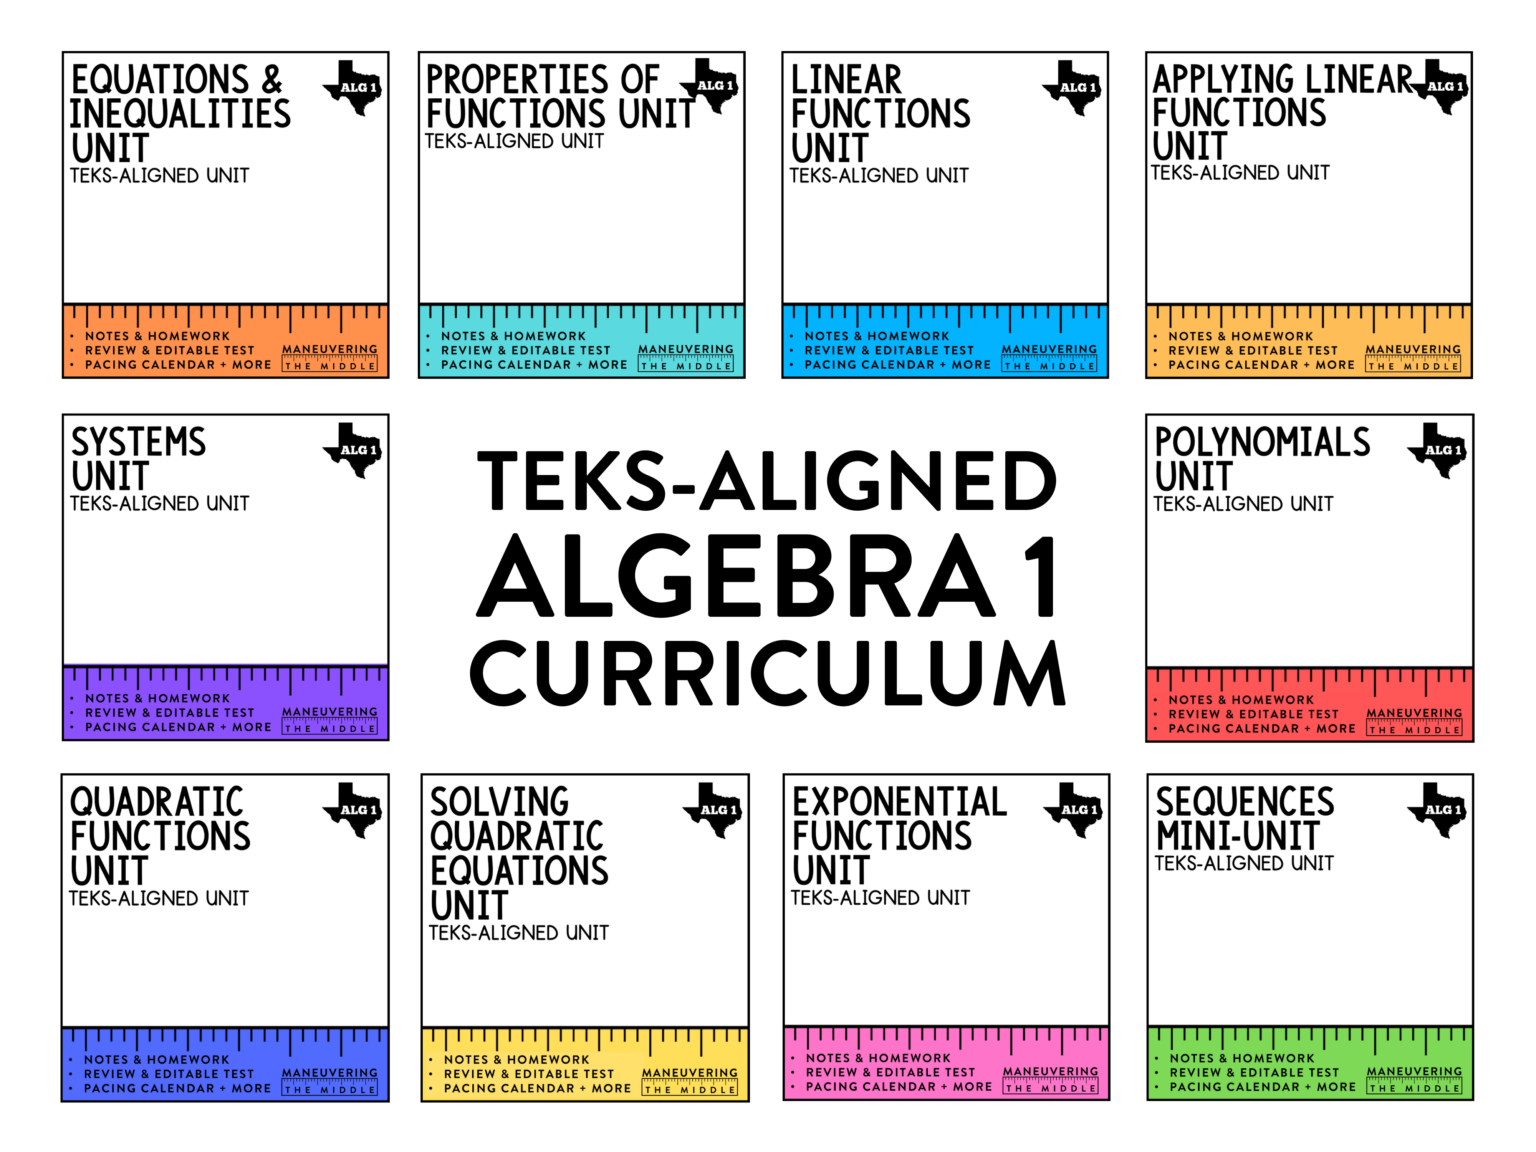 Algebra 1 Curriculum In